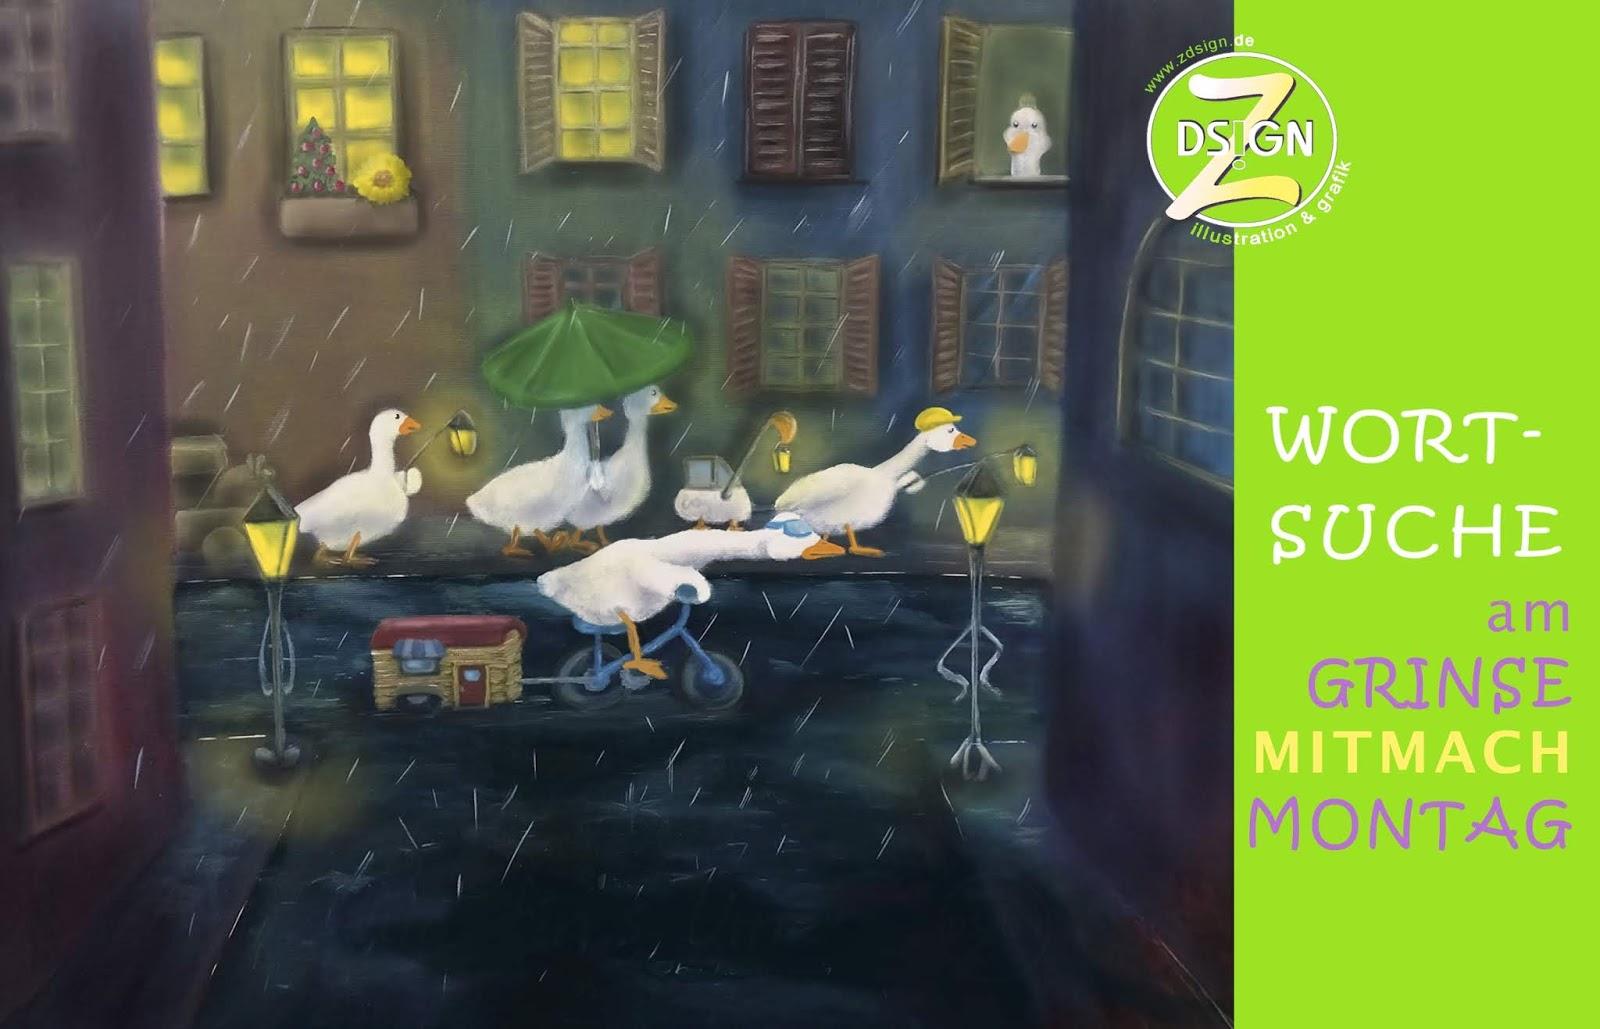 Martins-Umzug-illustration-zdsign-iris-Zeh